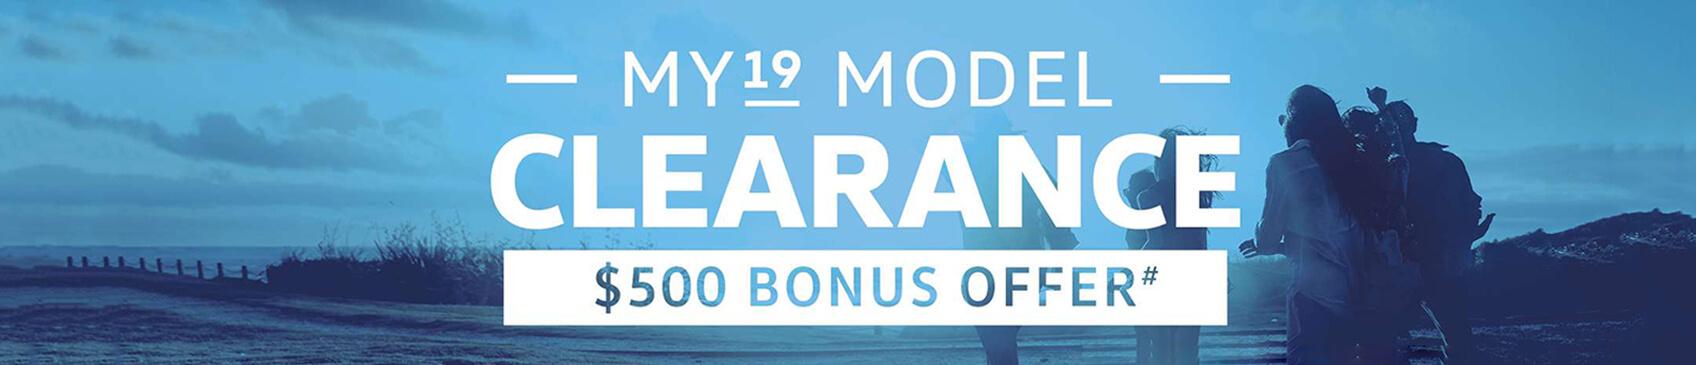 Volkswagen MY19 Model Clearance. Great Finance Offer